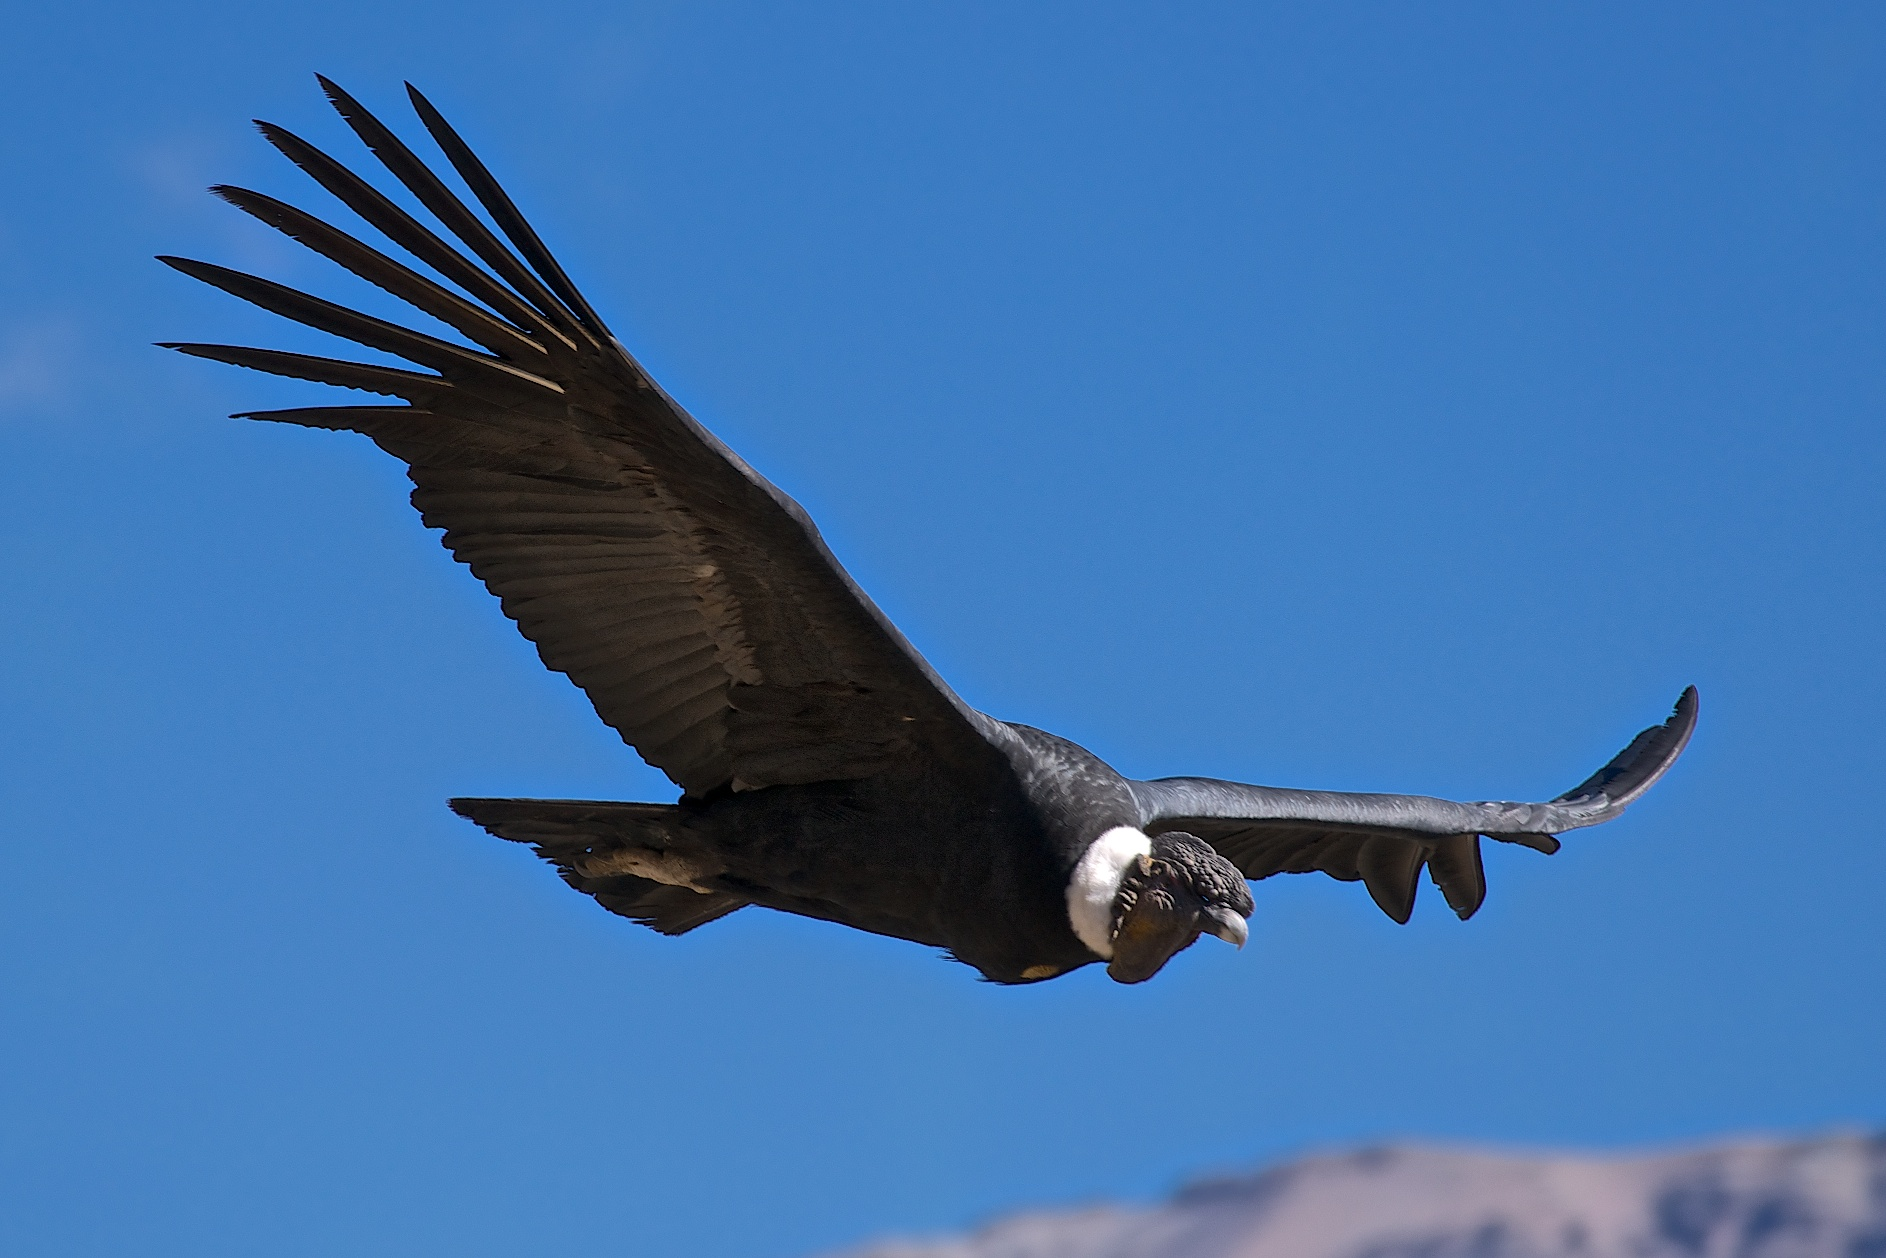 кондор птица фото еще забыт августовский